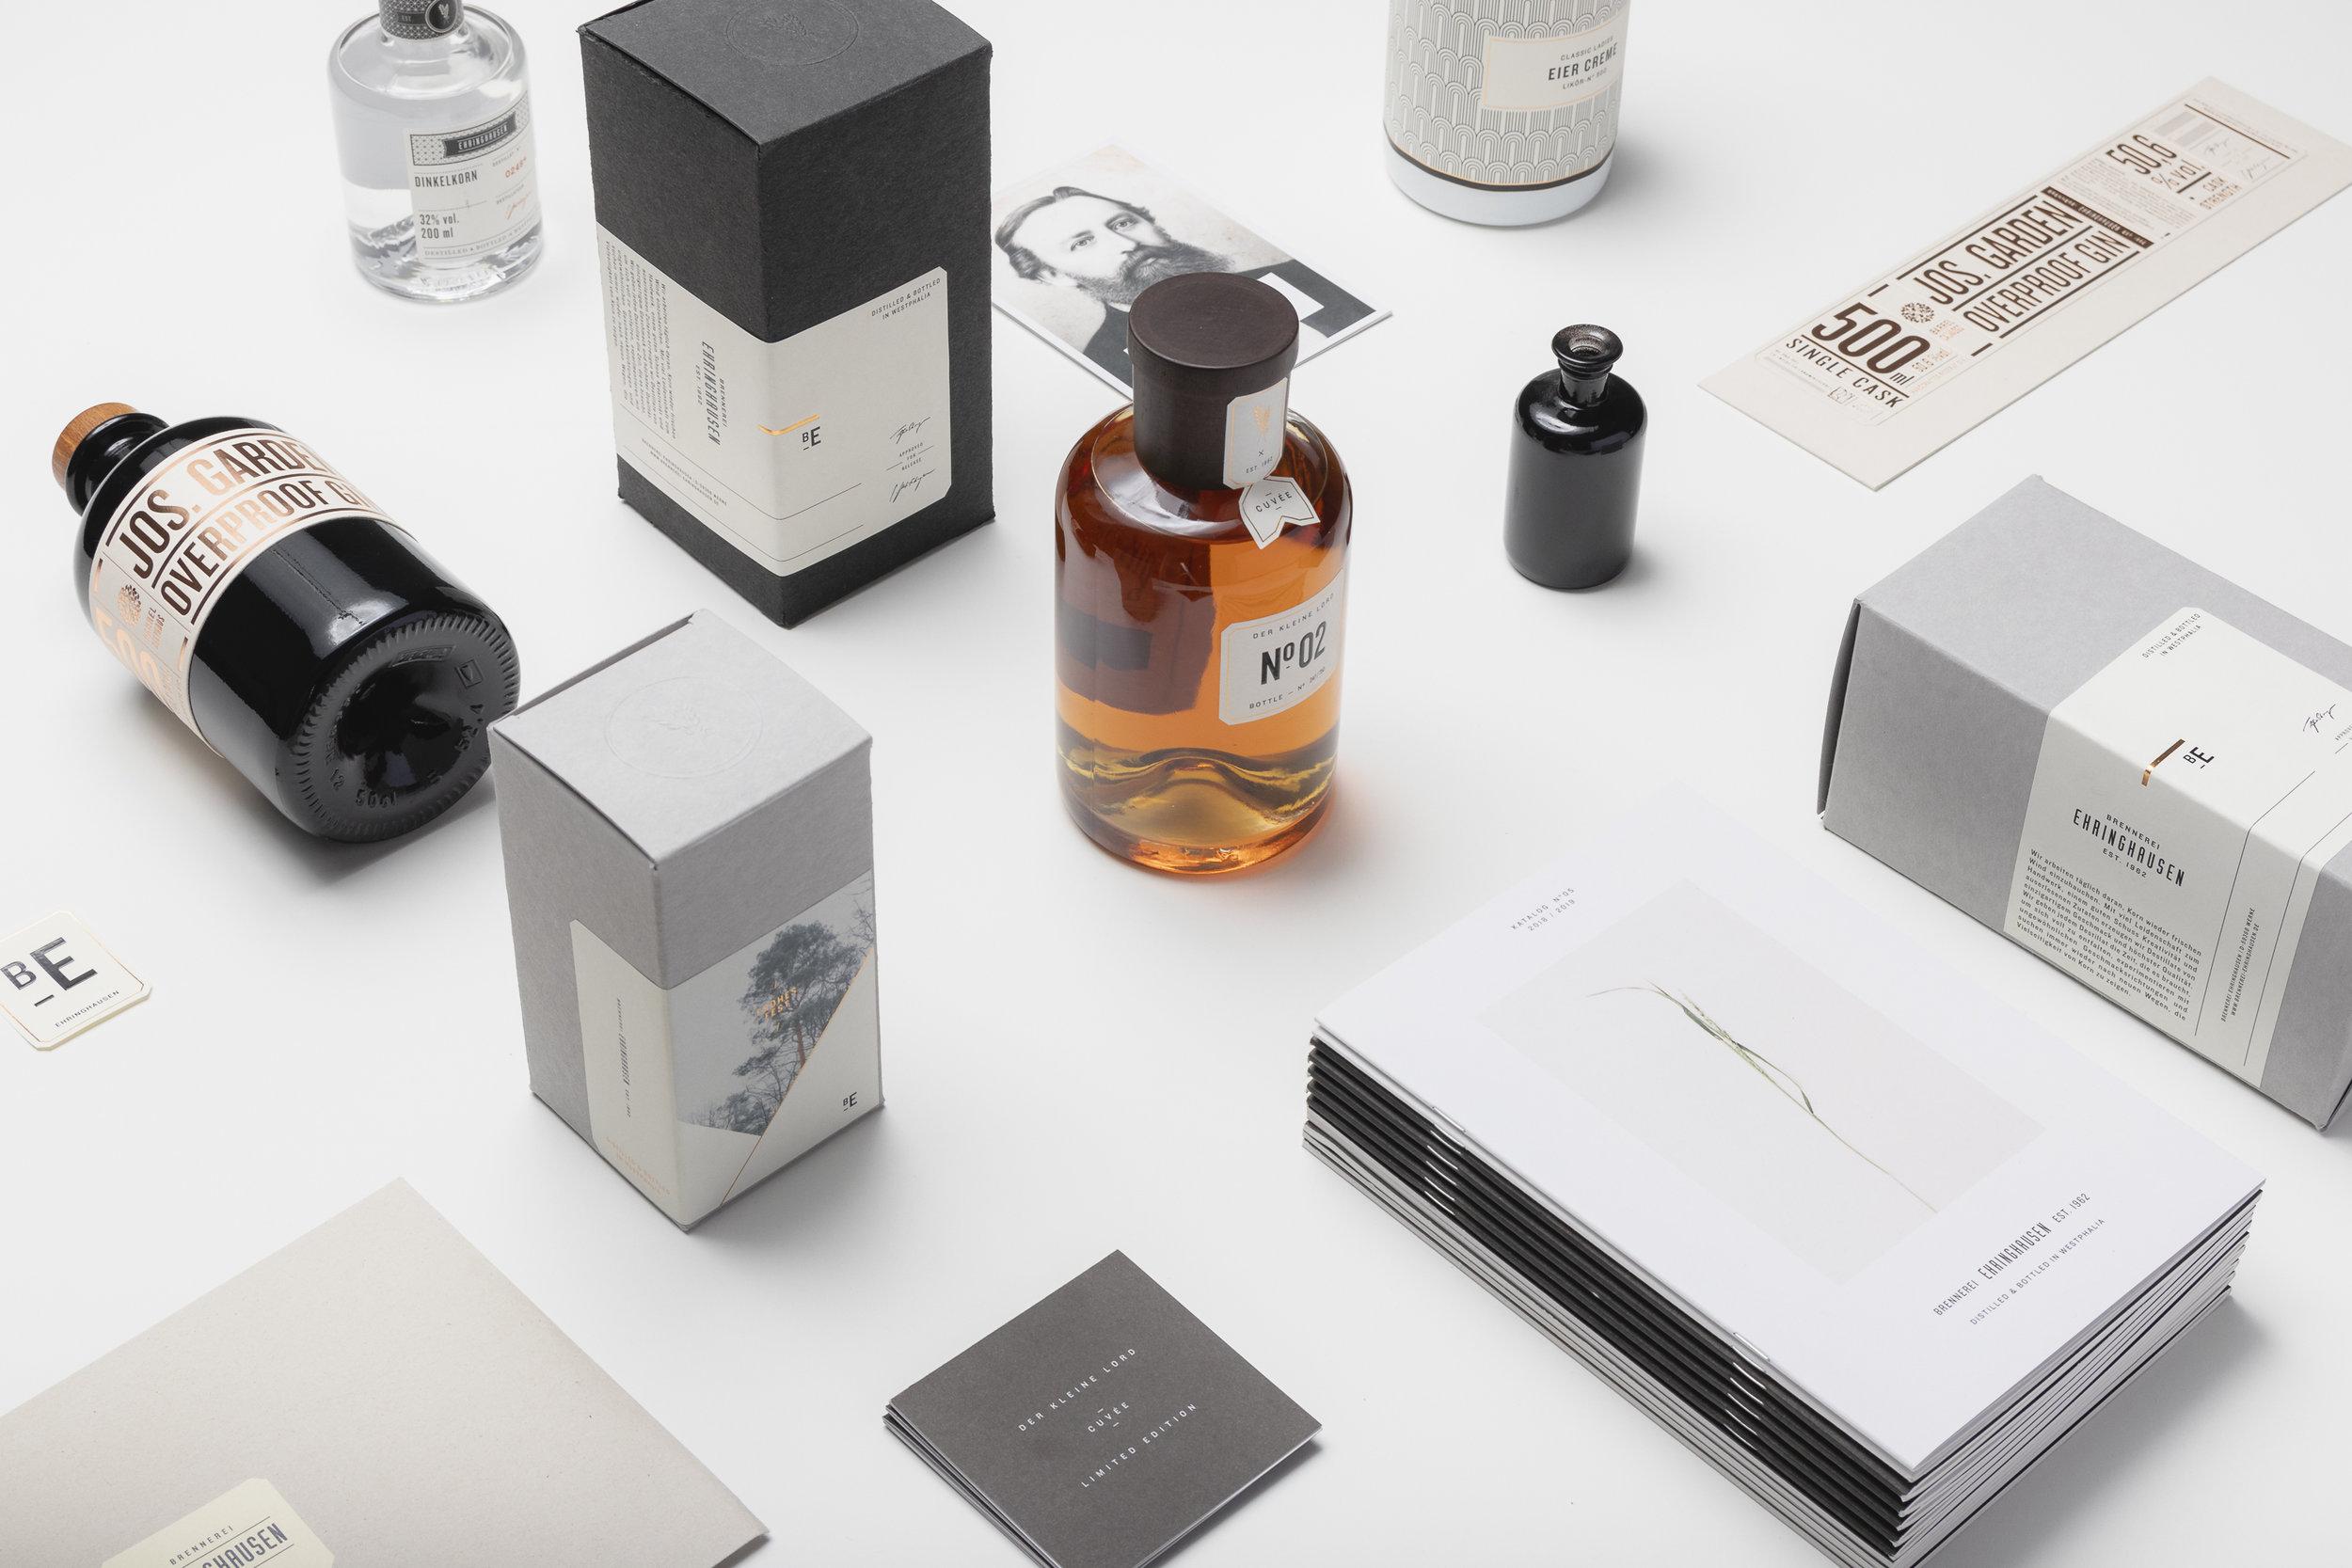 ffine_Brinkmann-Sonnenberg_Brennerei-Ehringhausen_corporate-design-2.jpg